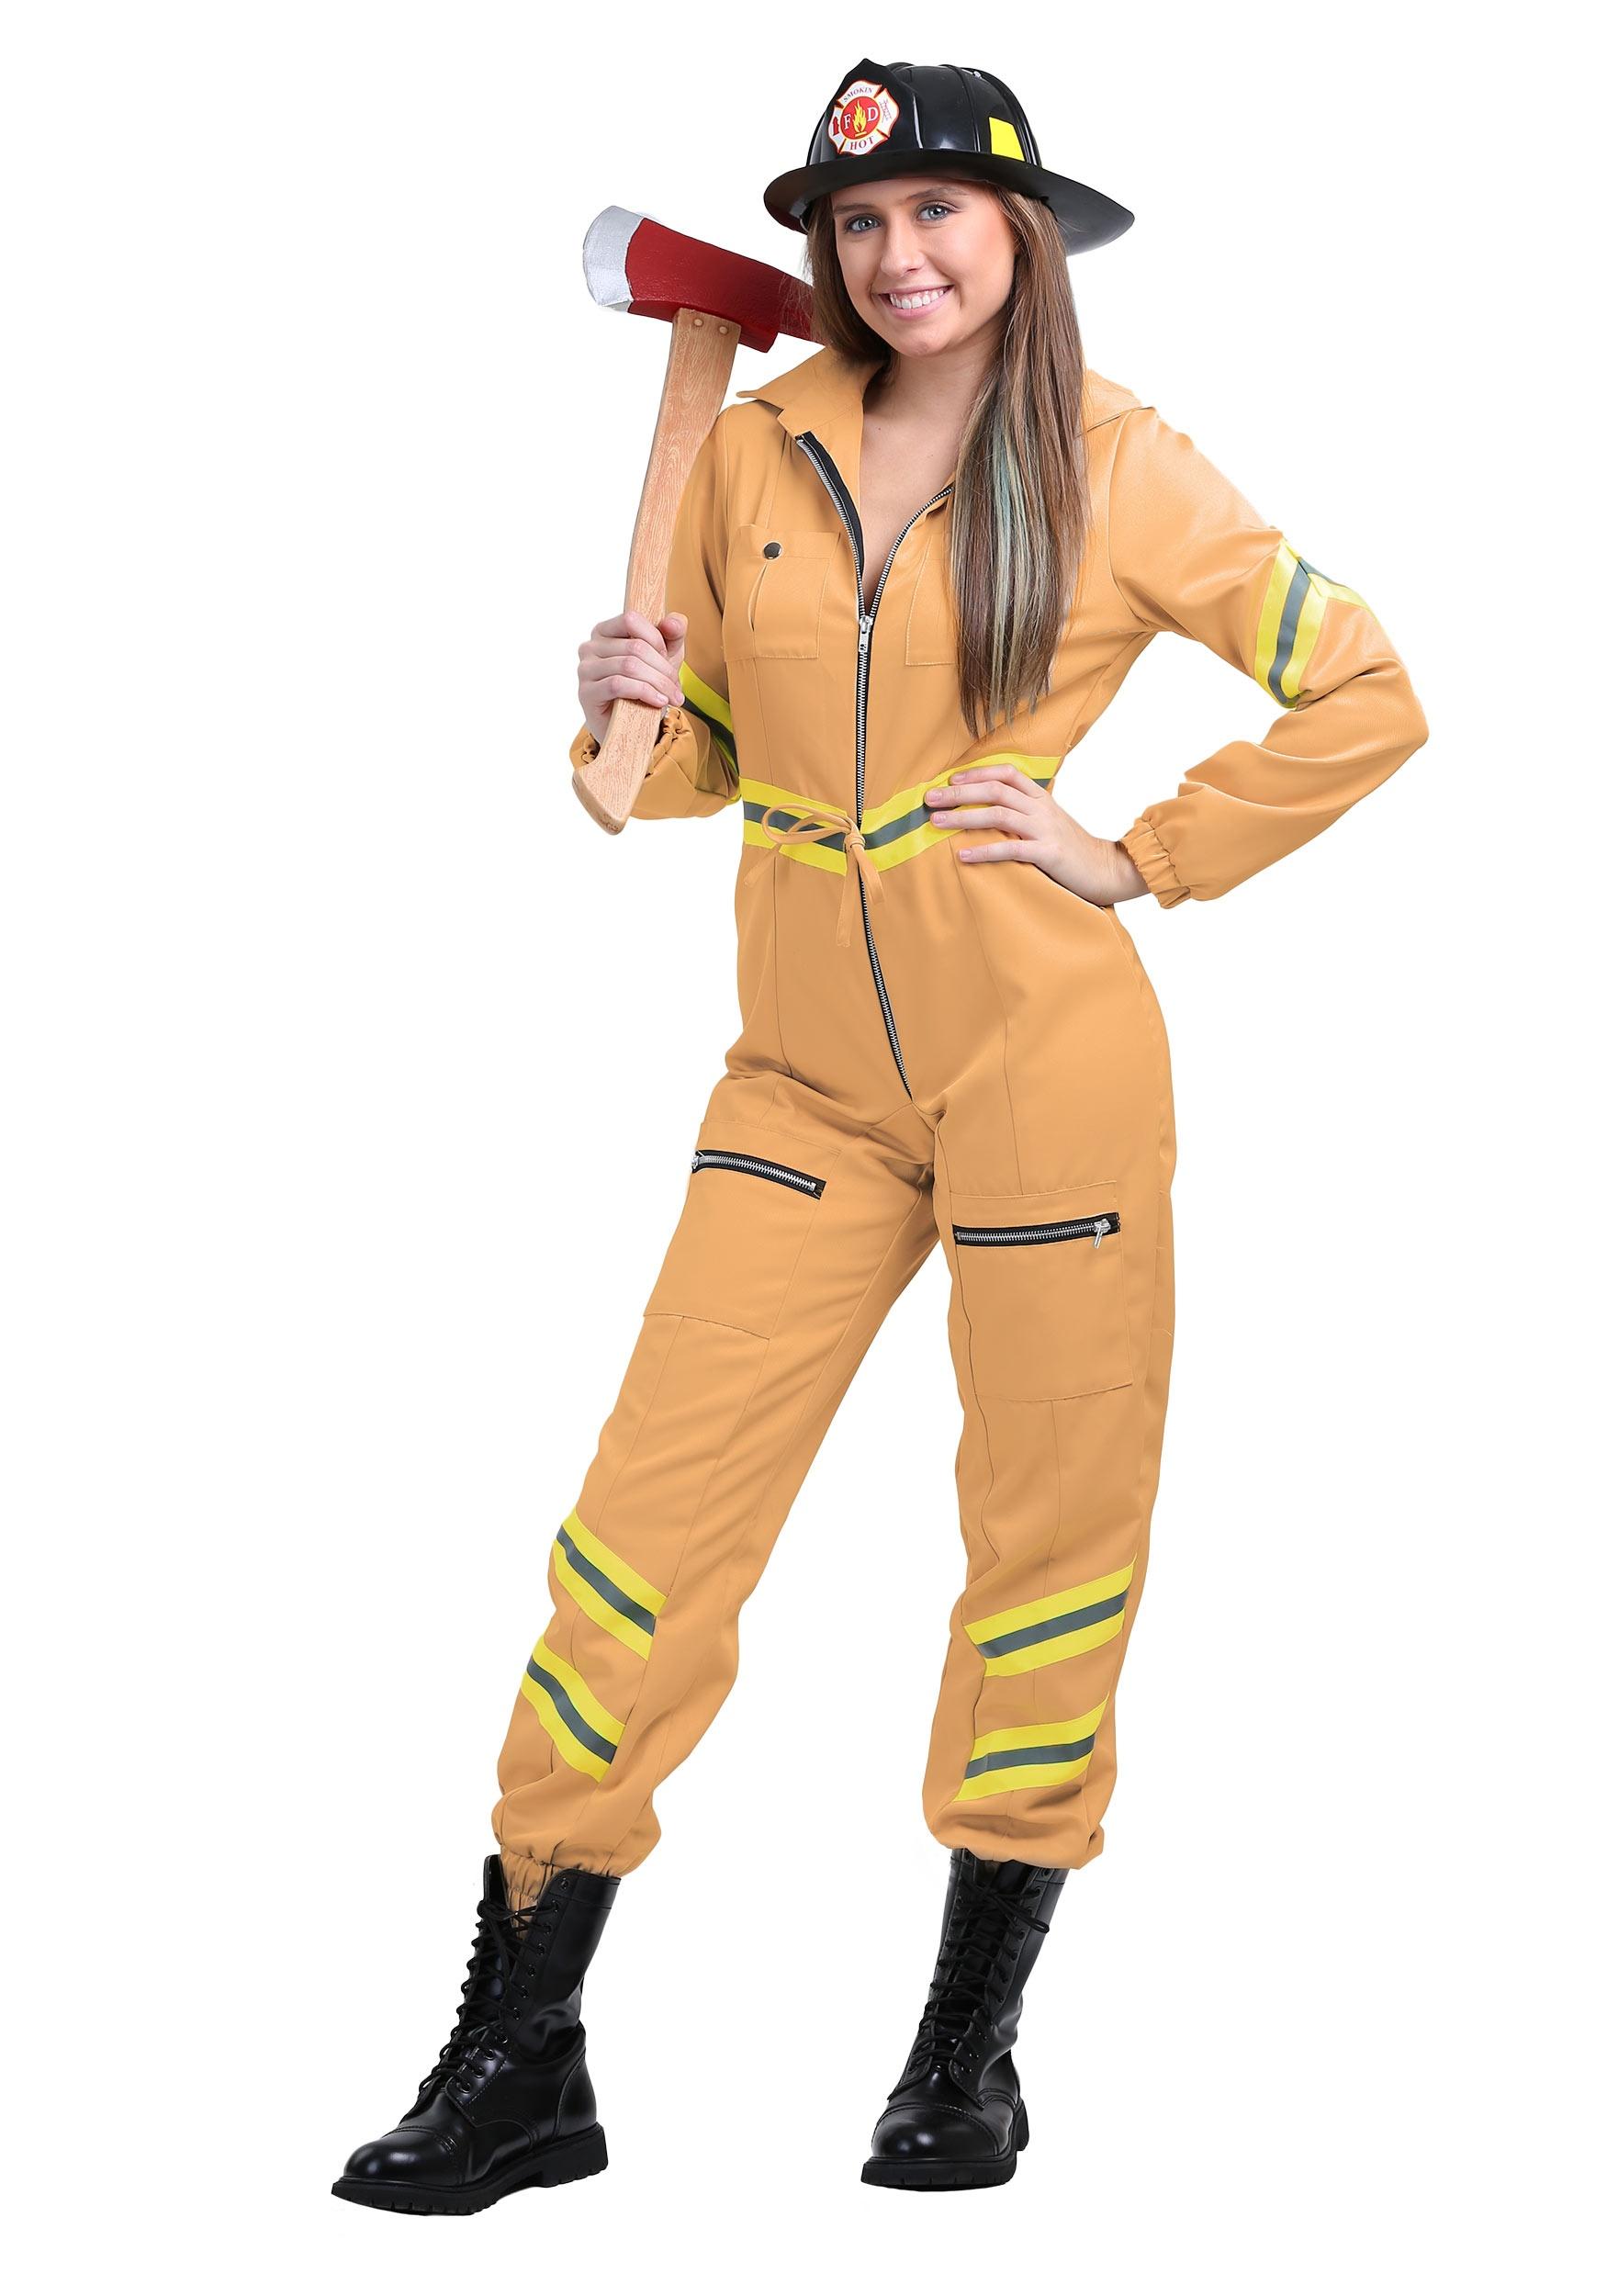 Tan Firefighter Jumpsuit Costume In Women S Plus Size 1x 2x